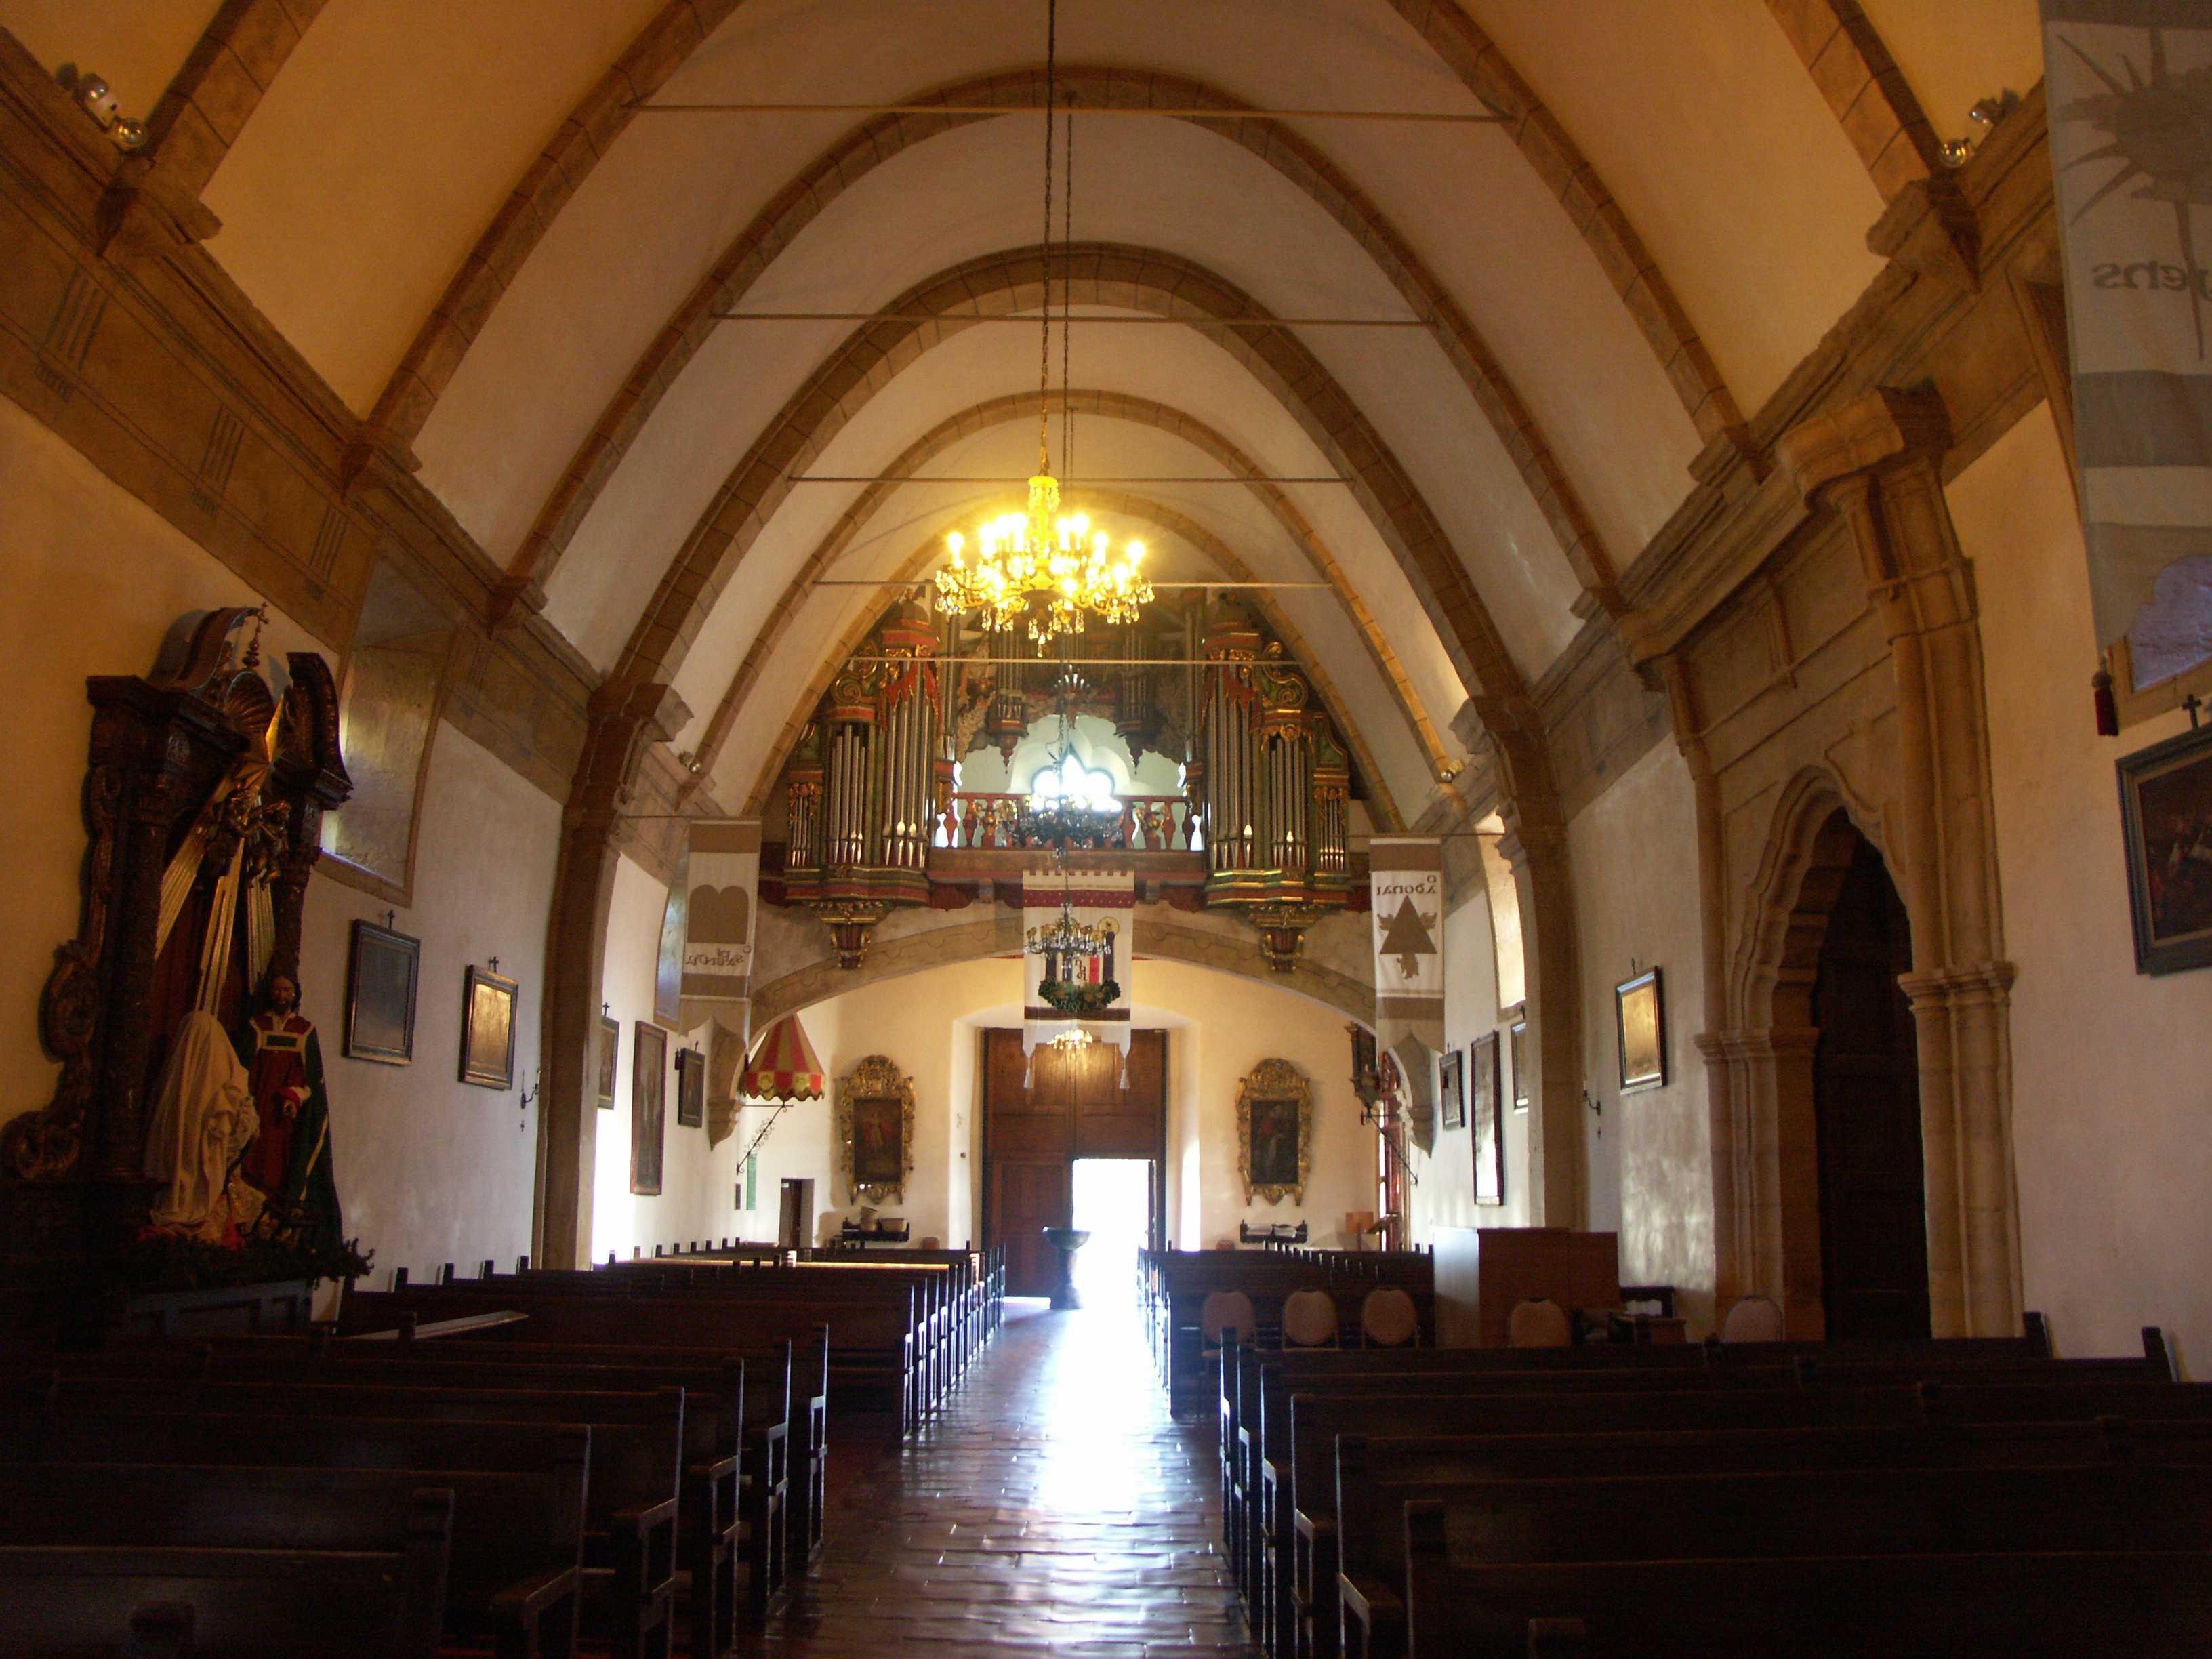 File:Carmel Mission - Inside church & organ.JPG - Wikimedia Commons